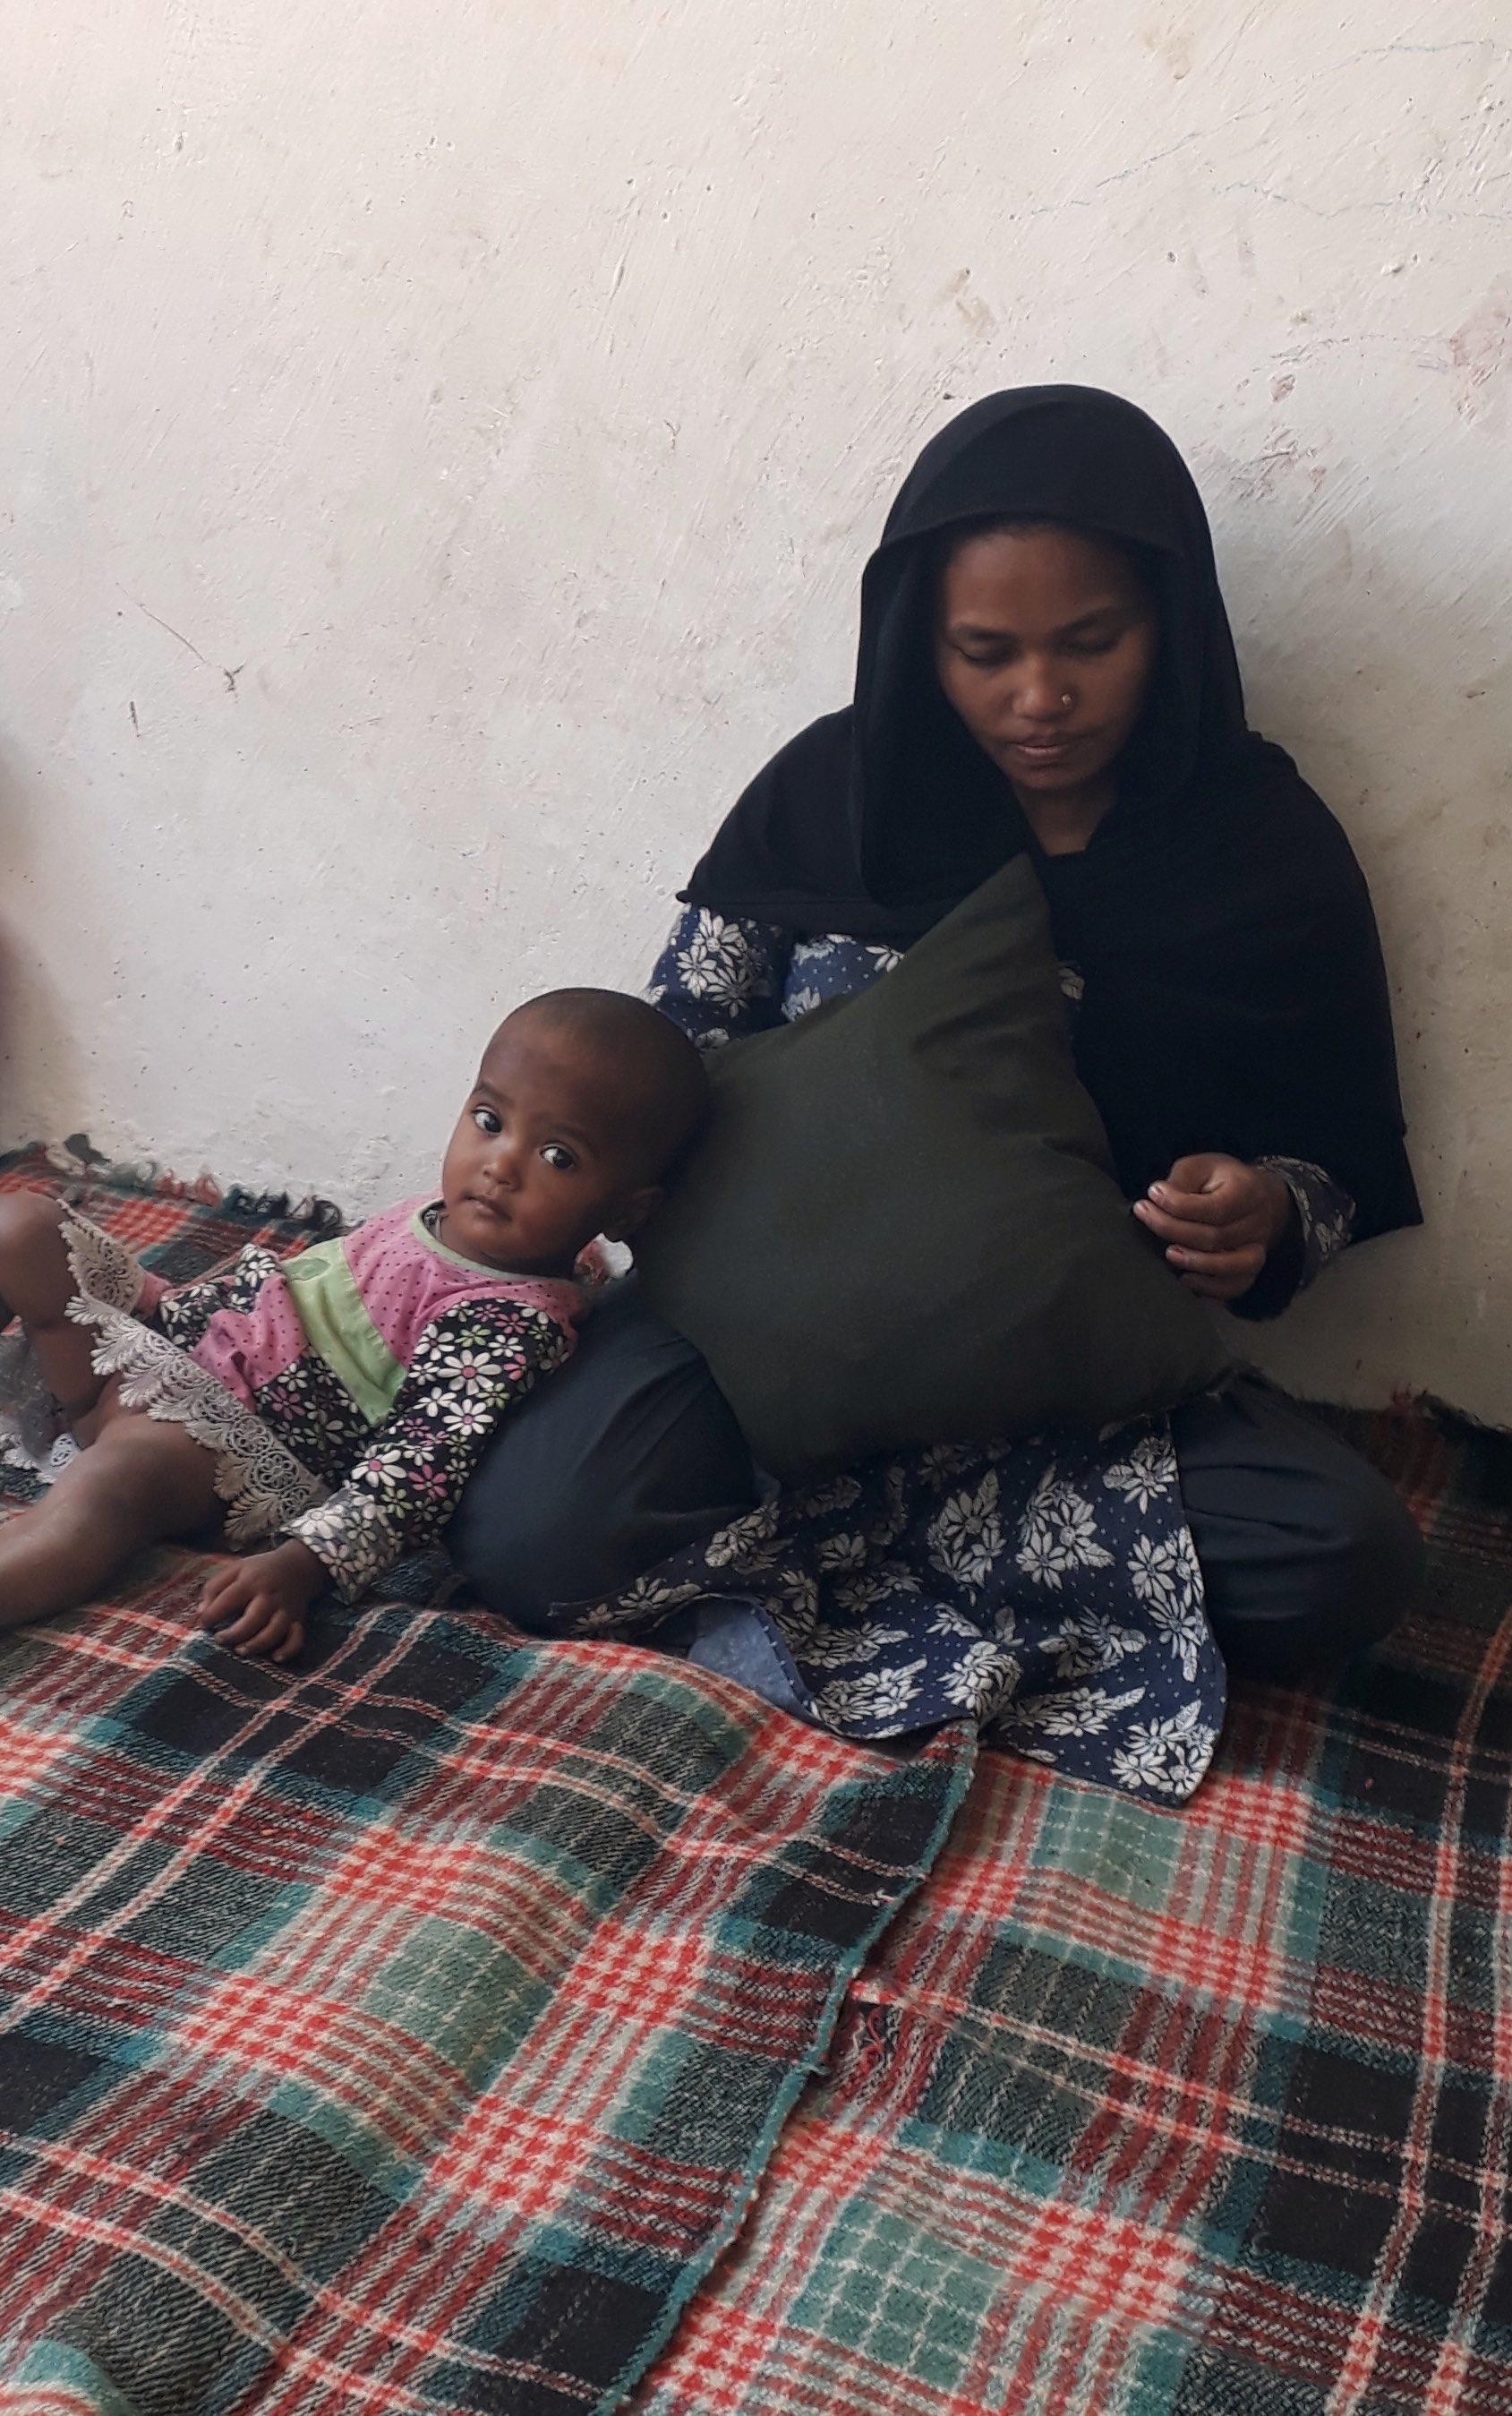 Yasmeena and her youngest daughter in their room. Credit: Mudasir Ahmed